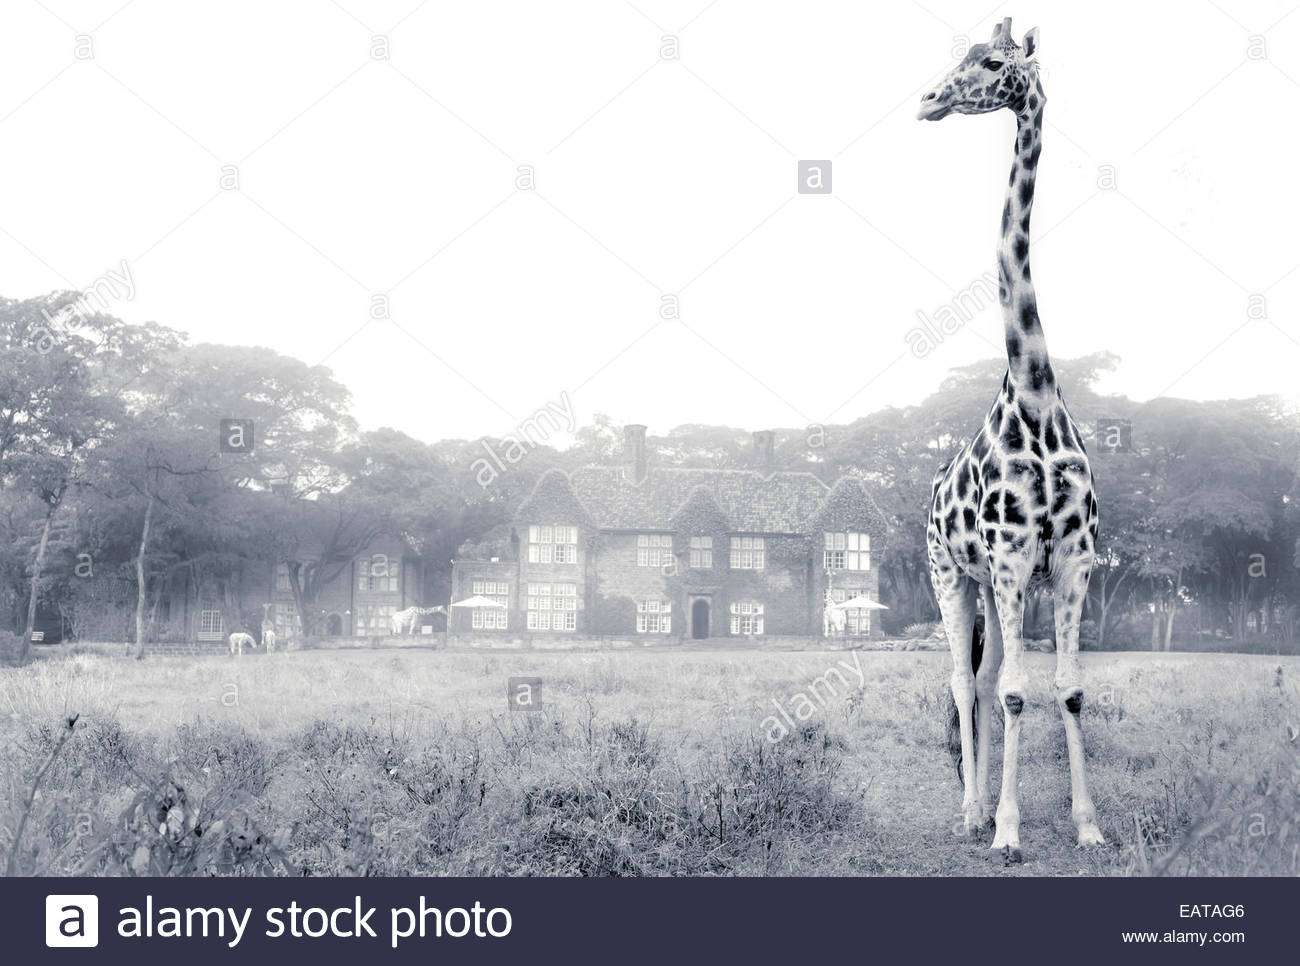 A Rothschild Giraffe in front of Giraffe Manor on a misty morning. - Stock Image